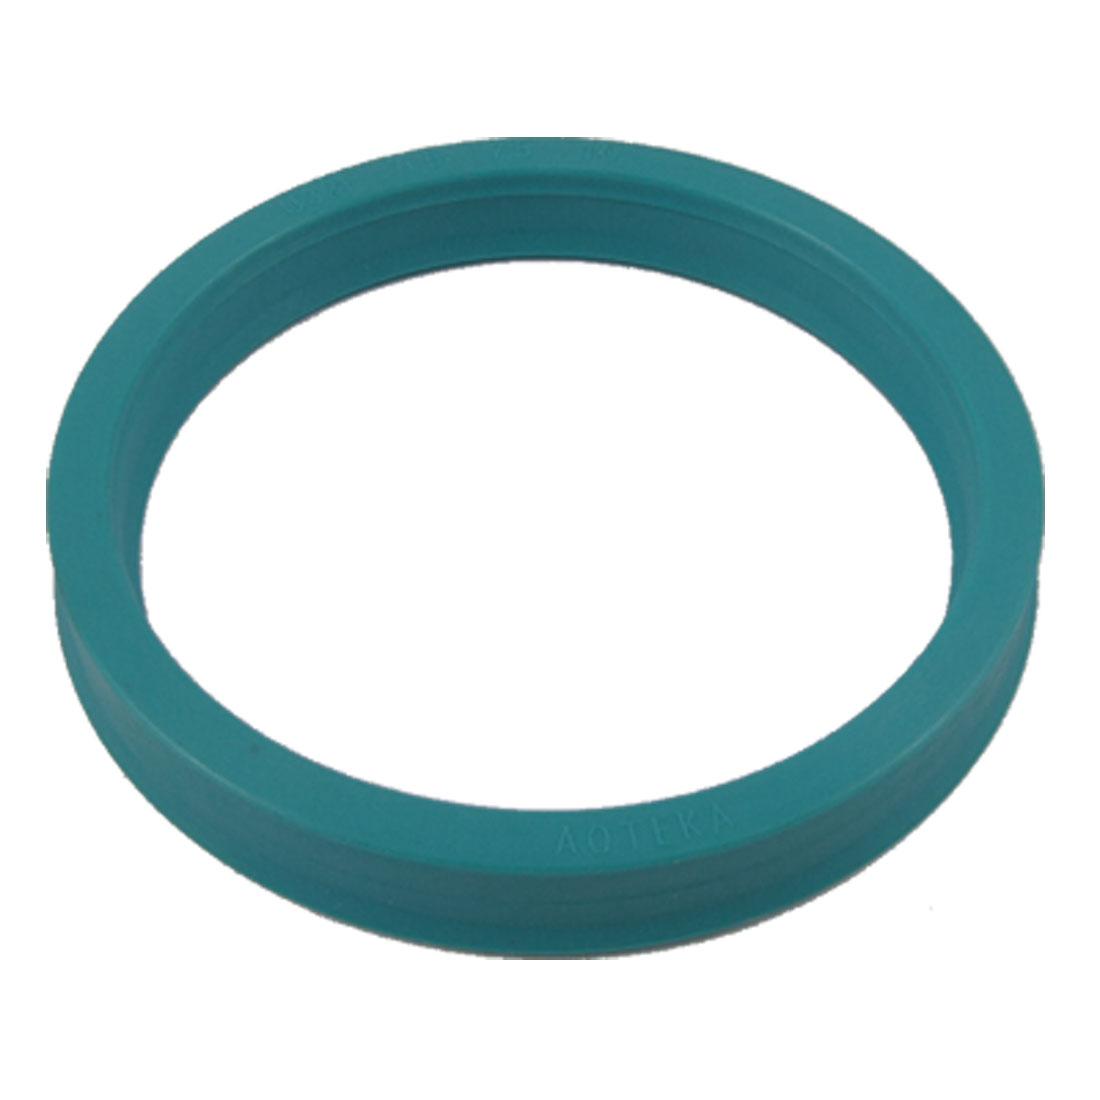 U32i PU Single Lip Metric Piston Rod Oil Seal 65x75x10mm for Hydraulic Cylinder